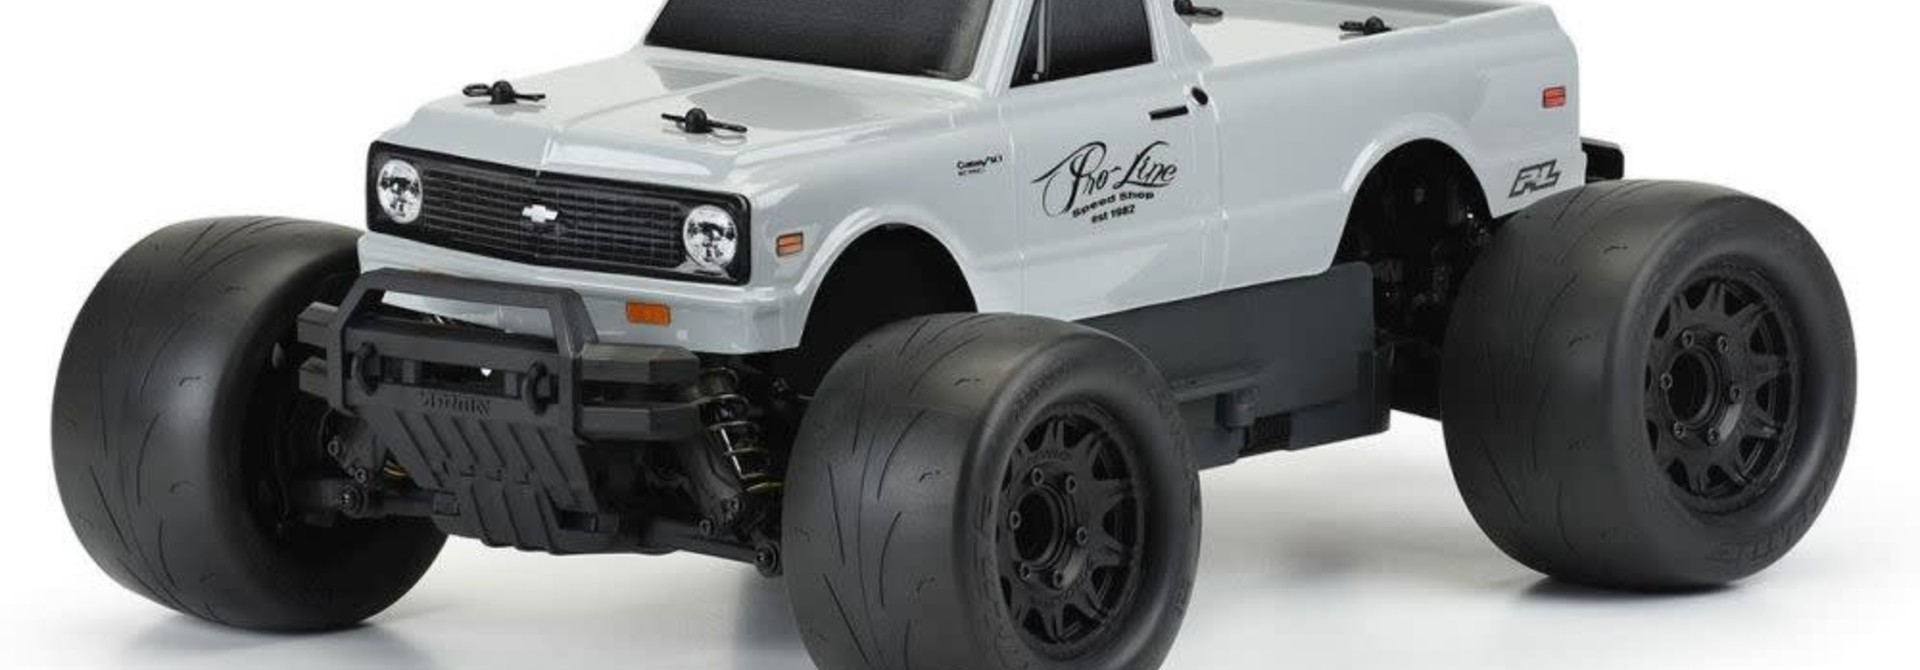 1972 Chevy® C-10™ Tough-Color (Stone Gray) Body for Stampede® & Granite™PR3251-14